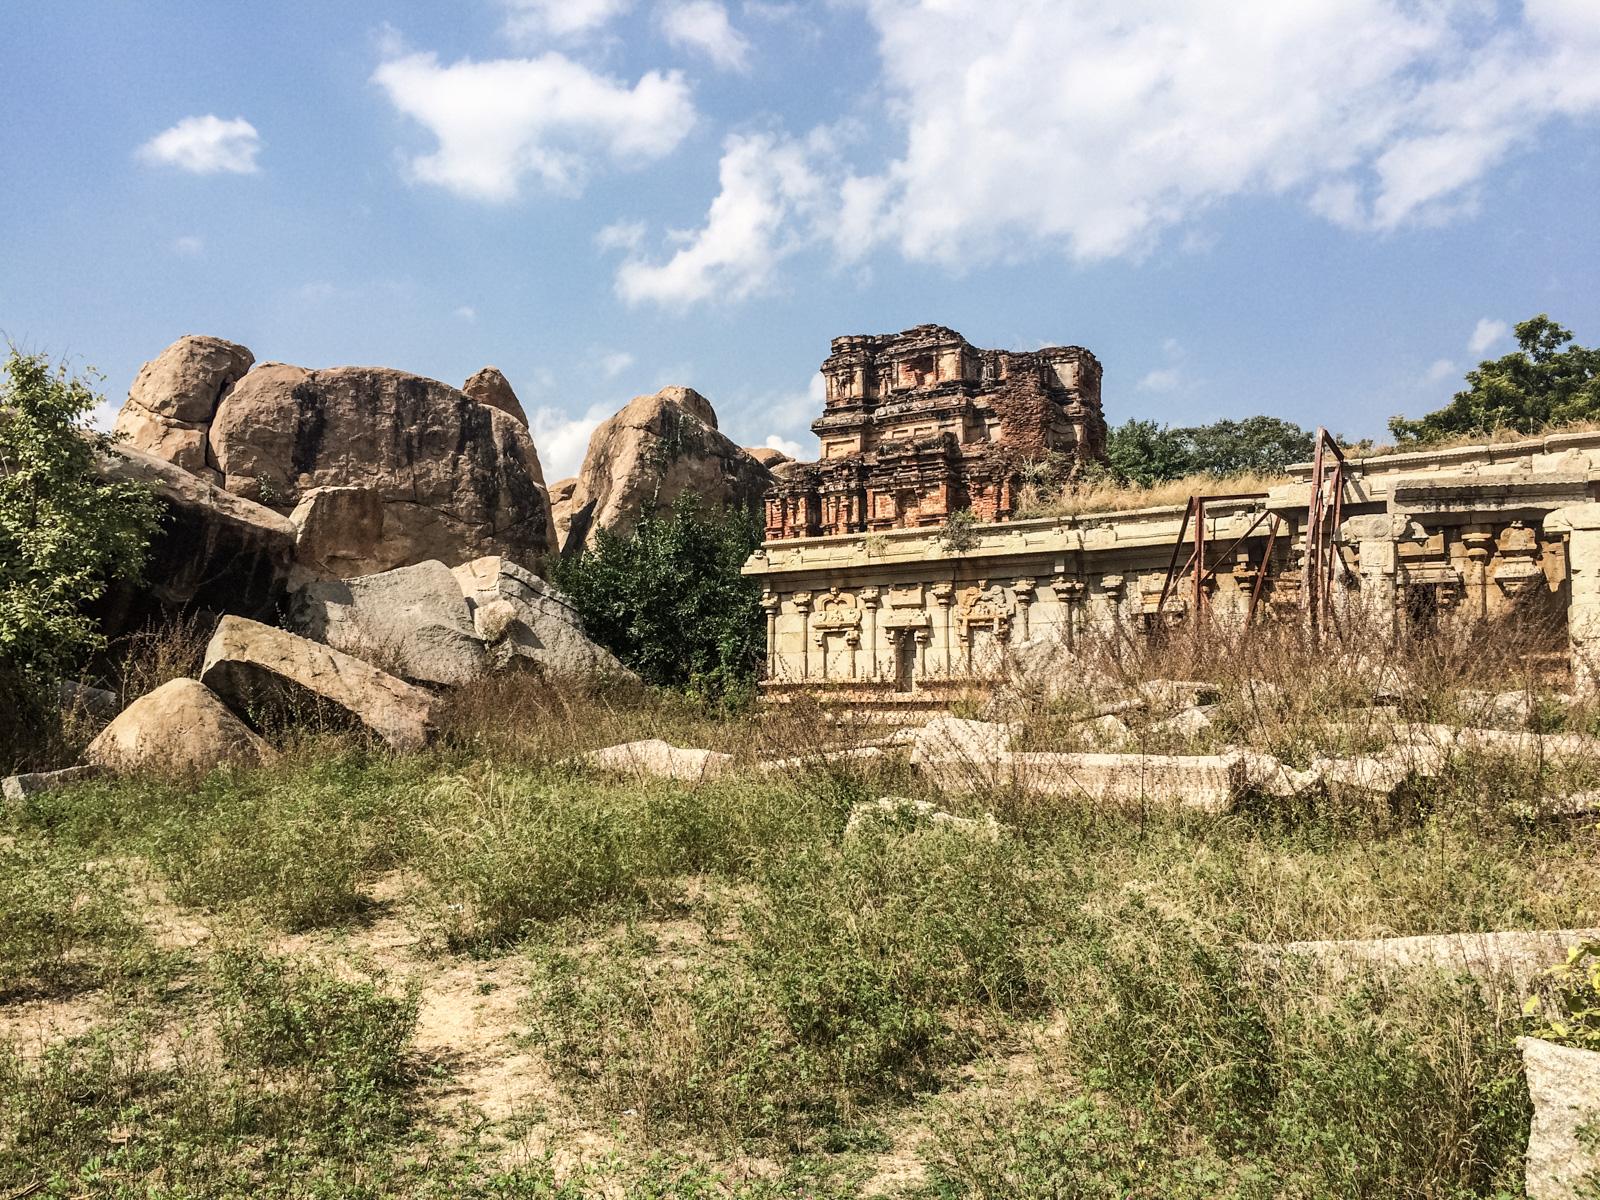 Hampi-India-bouldering-rockclimbing-AmyRolloPhoto-iphone-2653.jpg